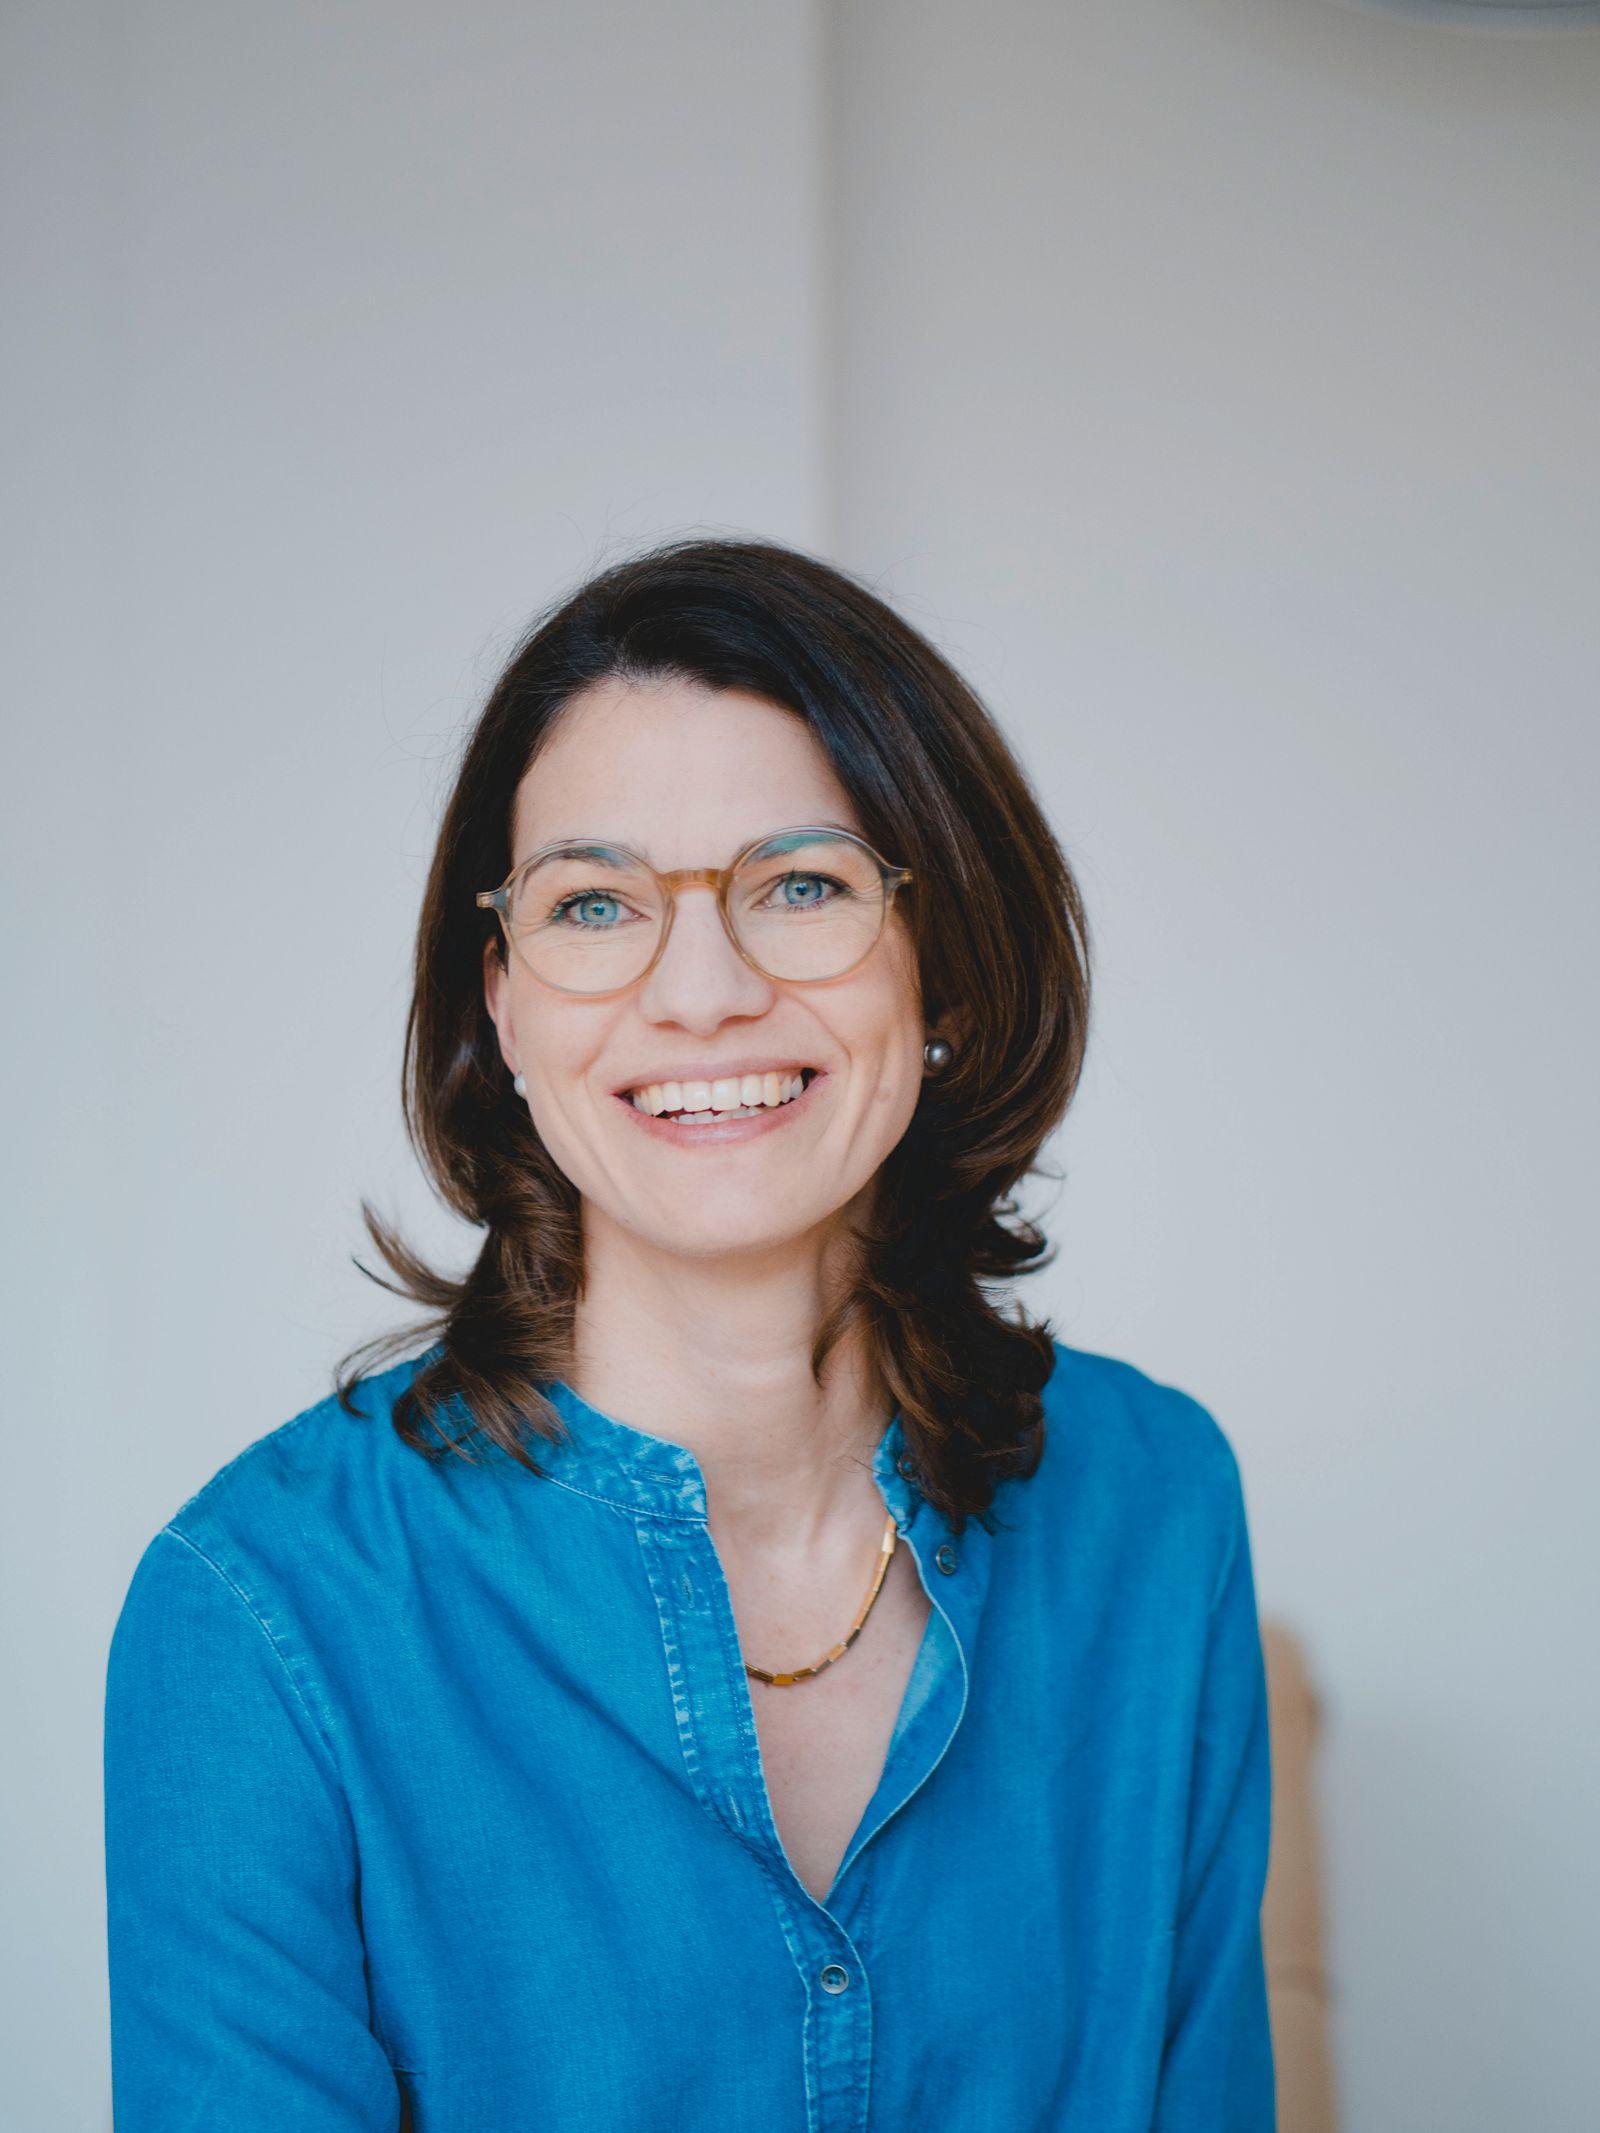 Prof. Dr. Cornelia Betsch Foto Marco Borggreve 01